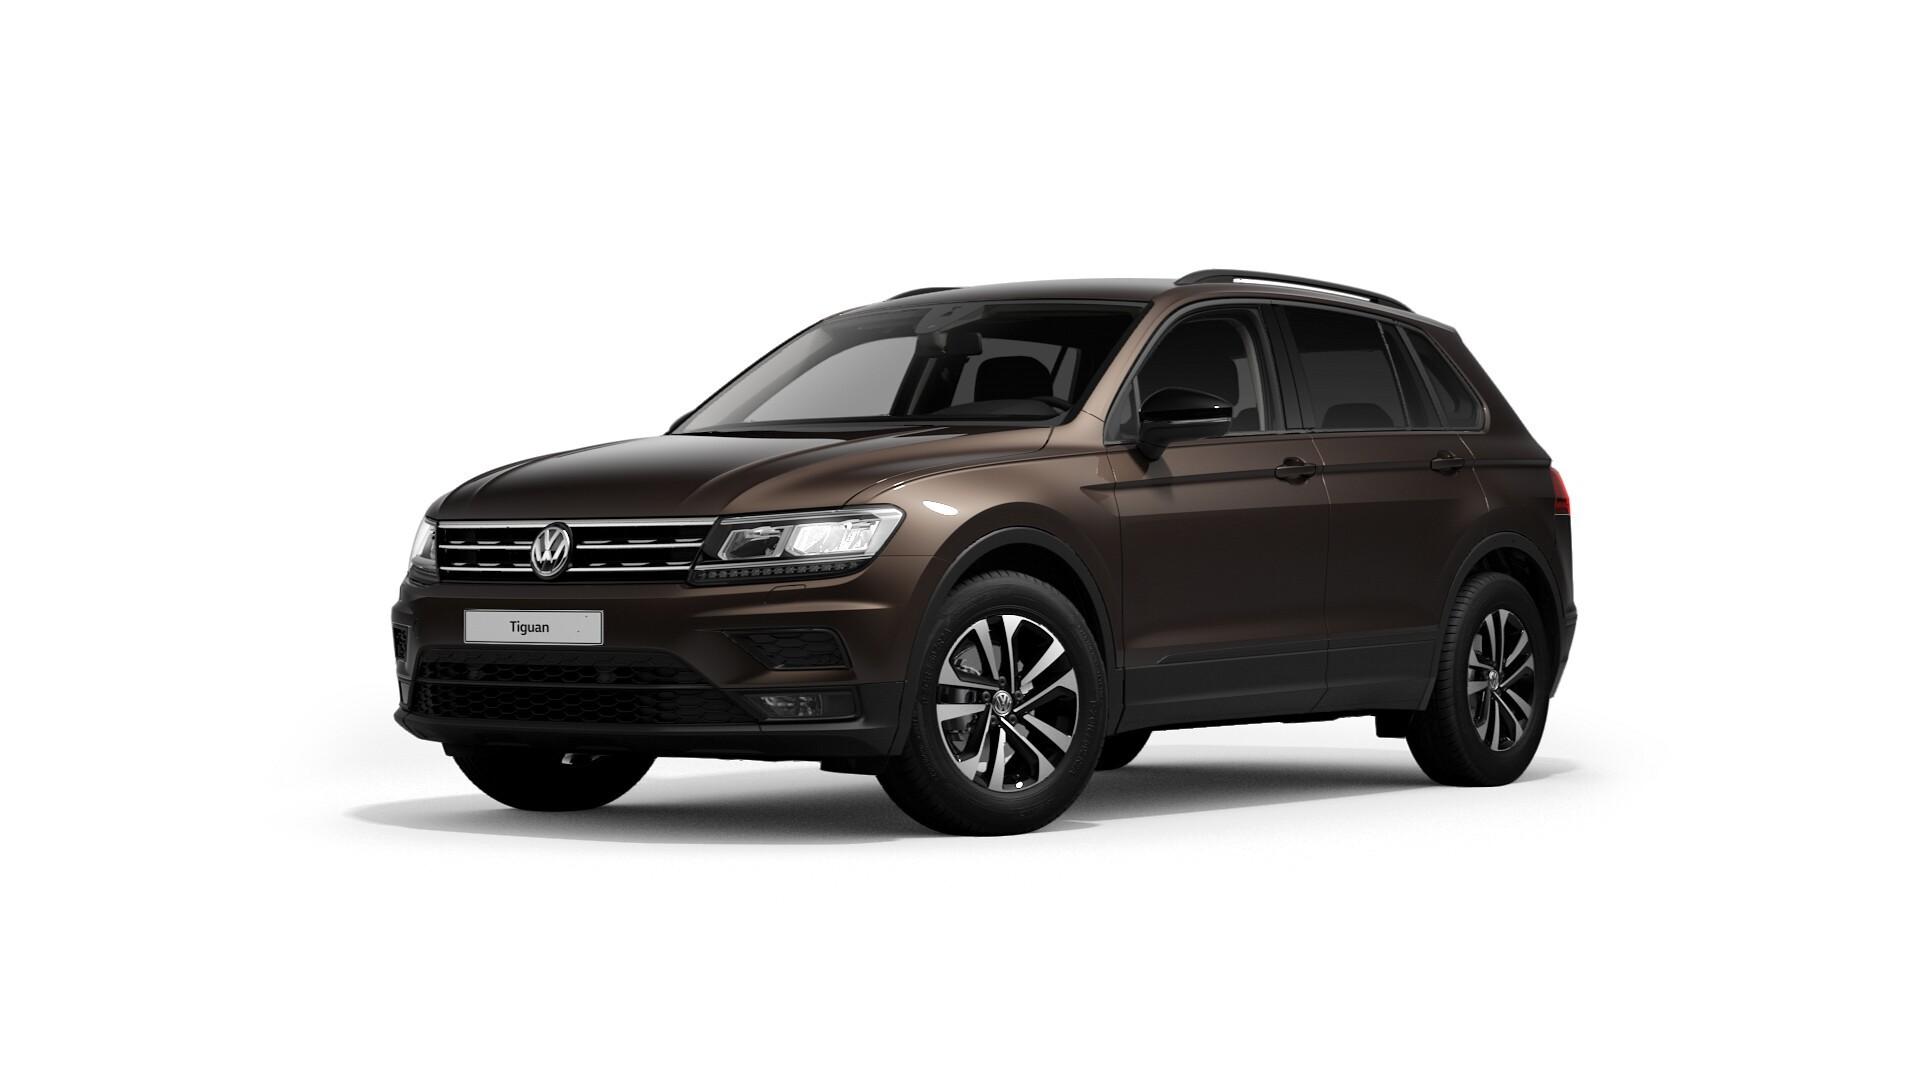 Volkswagen Tiguan Внедорожник (Connect)